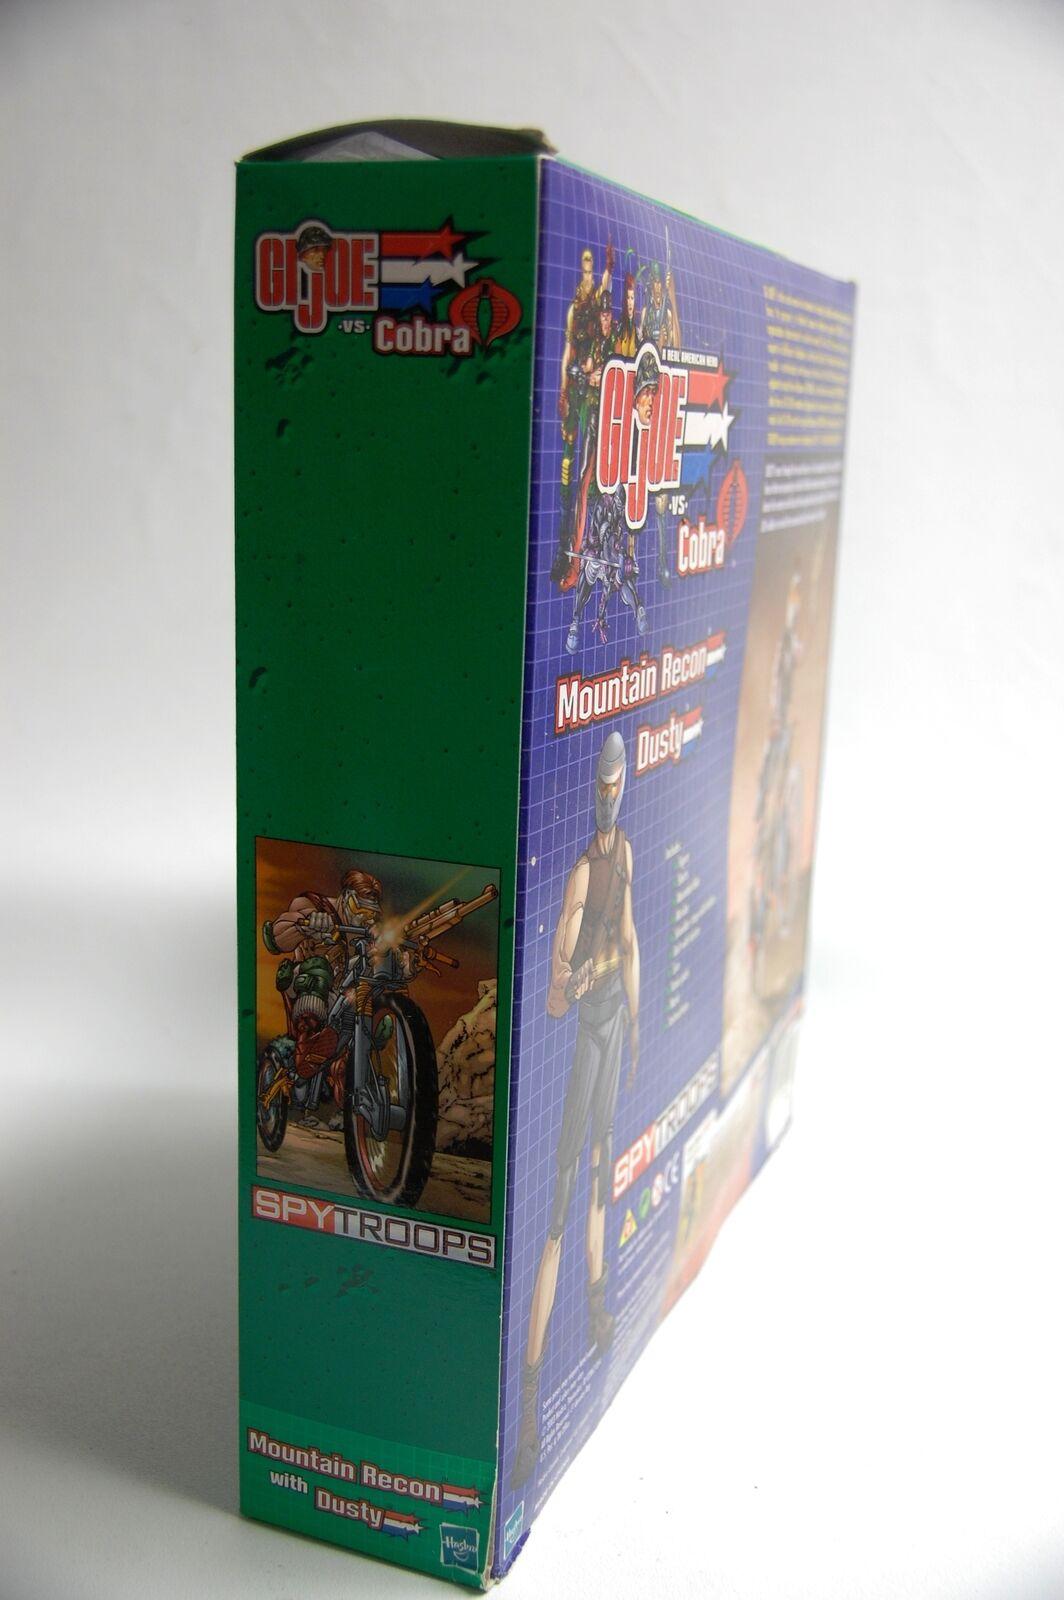 Hasbro Hasbro Hasbro GI Joe vs Cobra Spy Troops Mountain